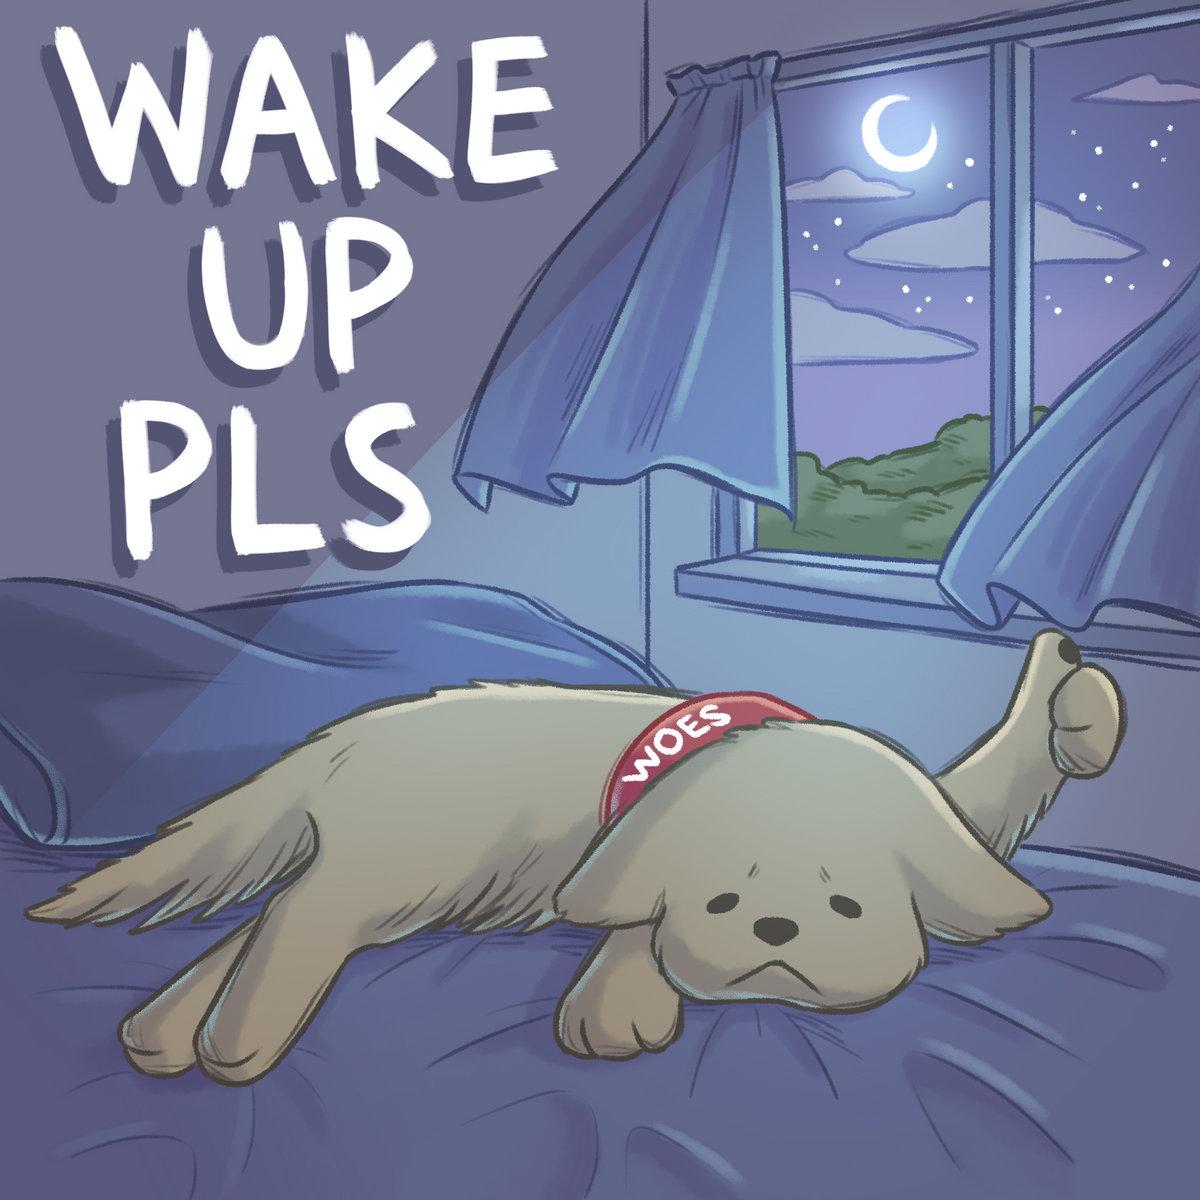 Woes - Wake Up Pls